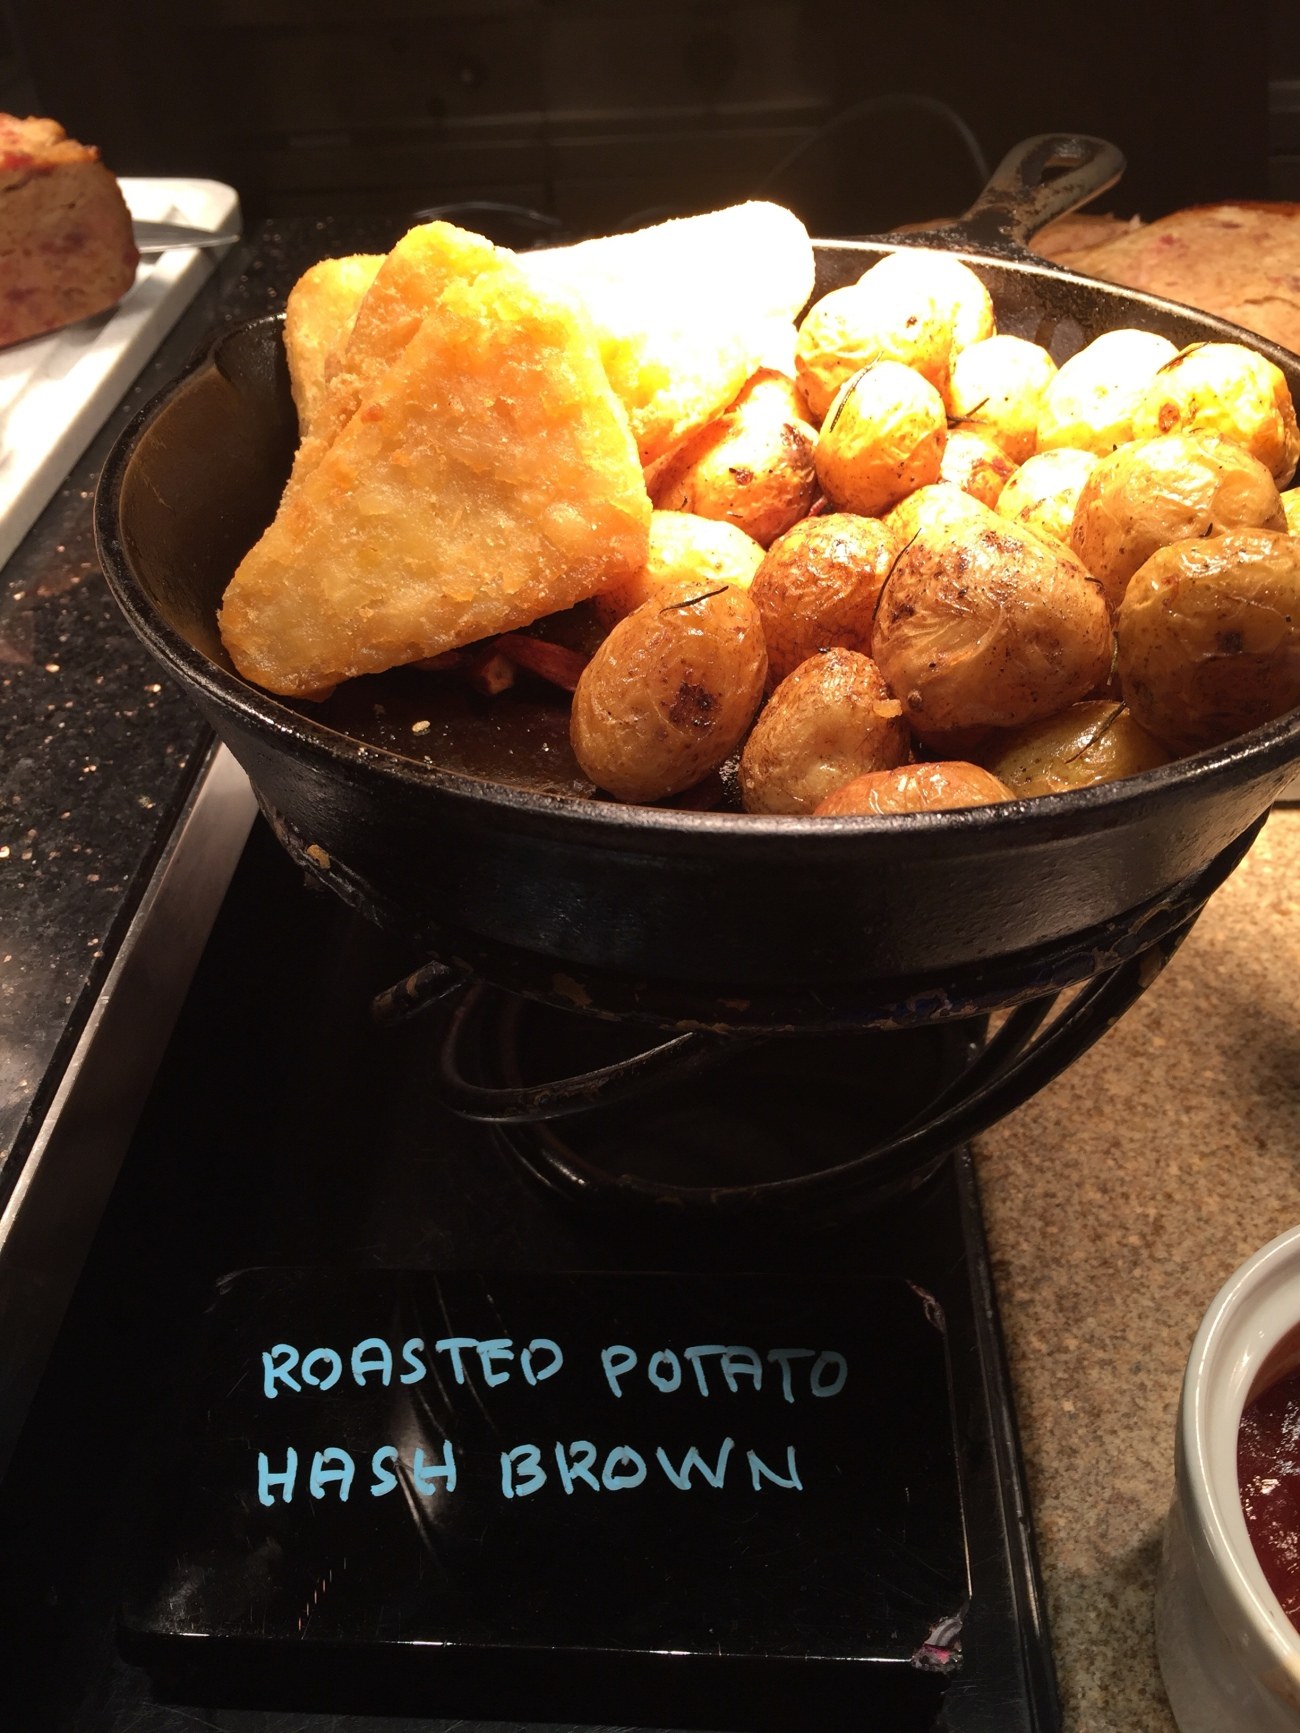 Roasted potatoes hash brown